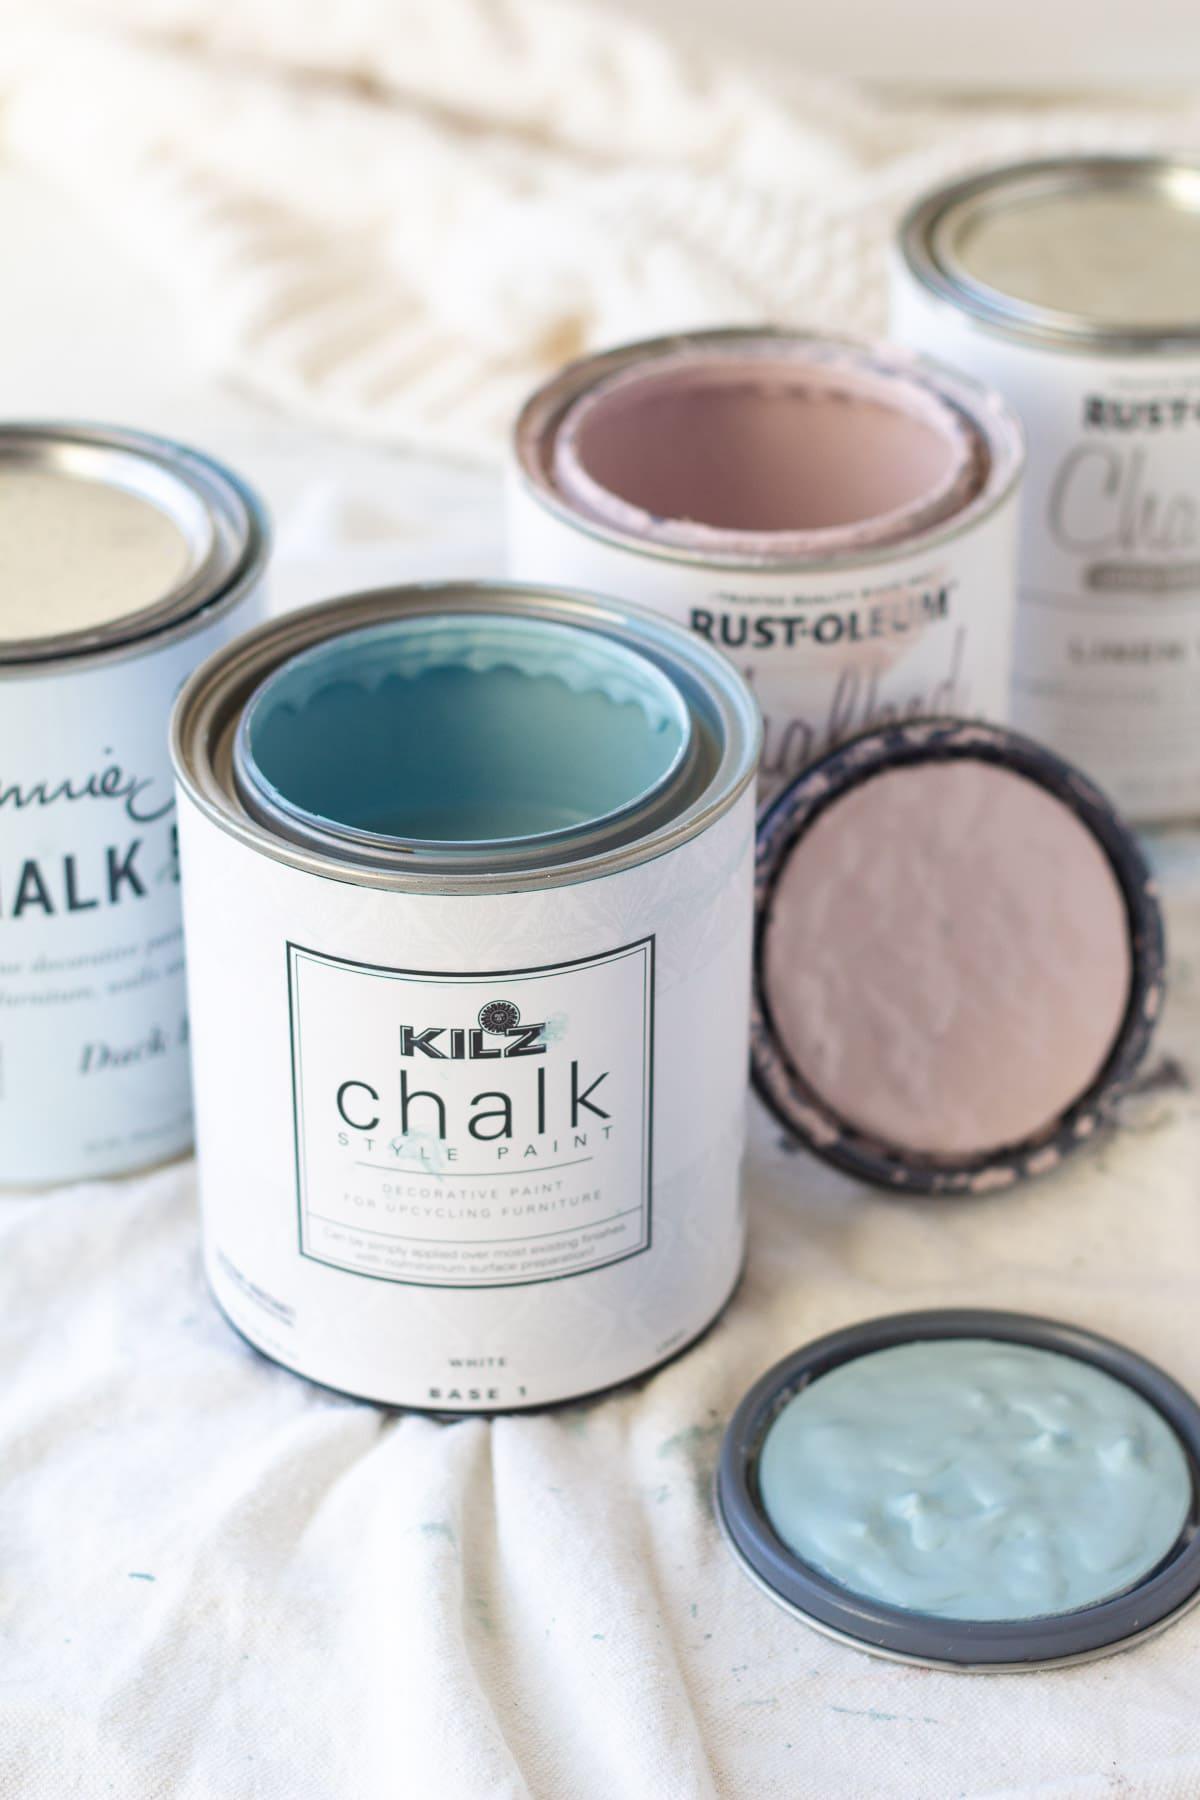 An open can of KILZ Chalk Style Paint in Blue Juniper.